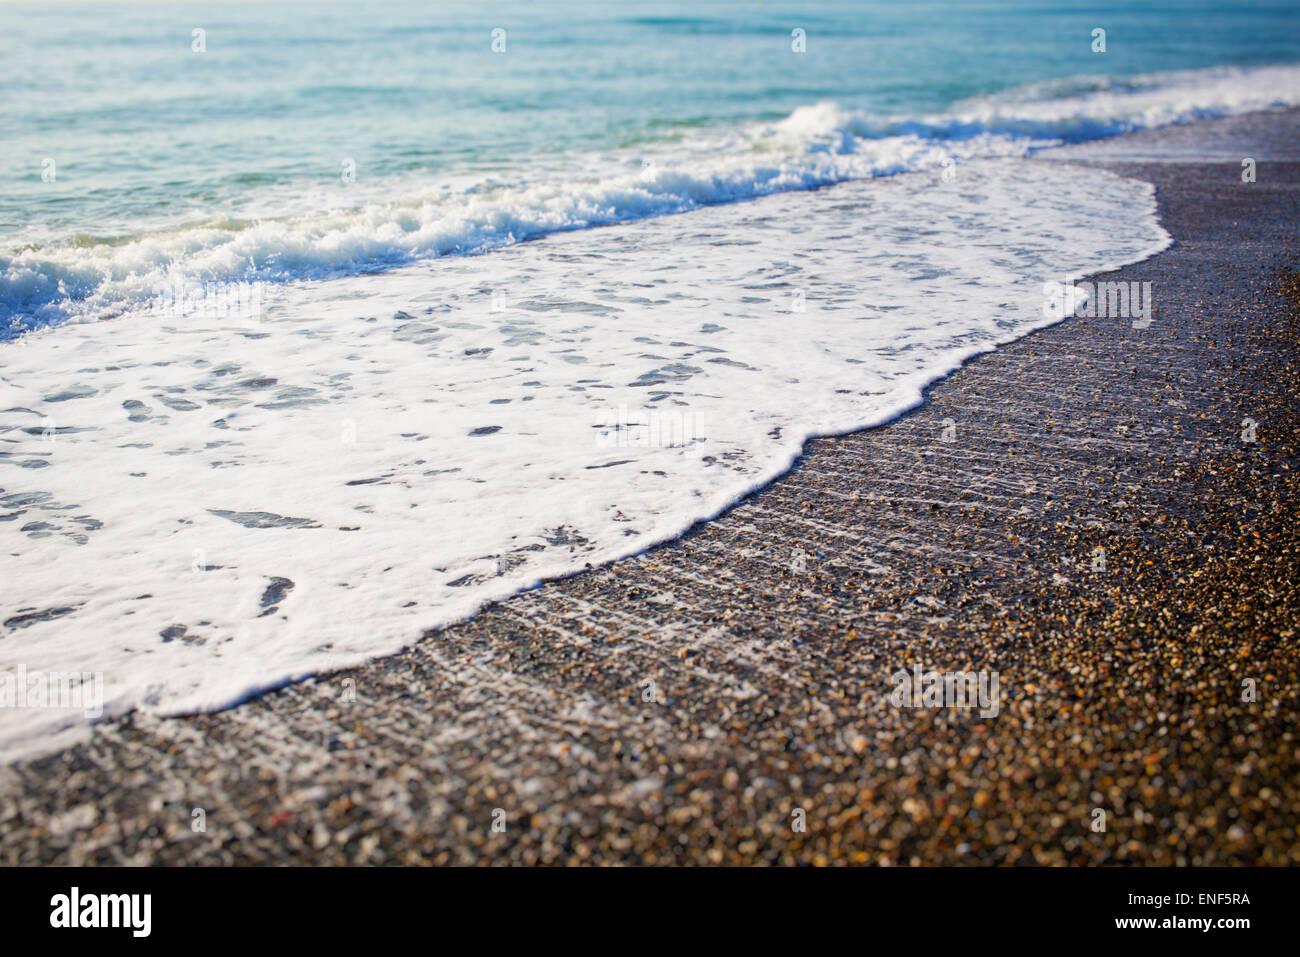 Waves breaking on seashore. - Stock Image